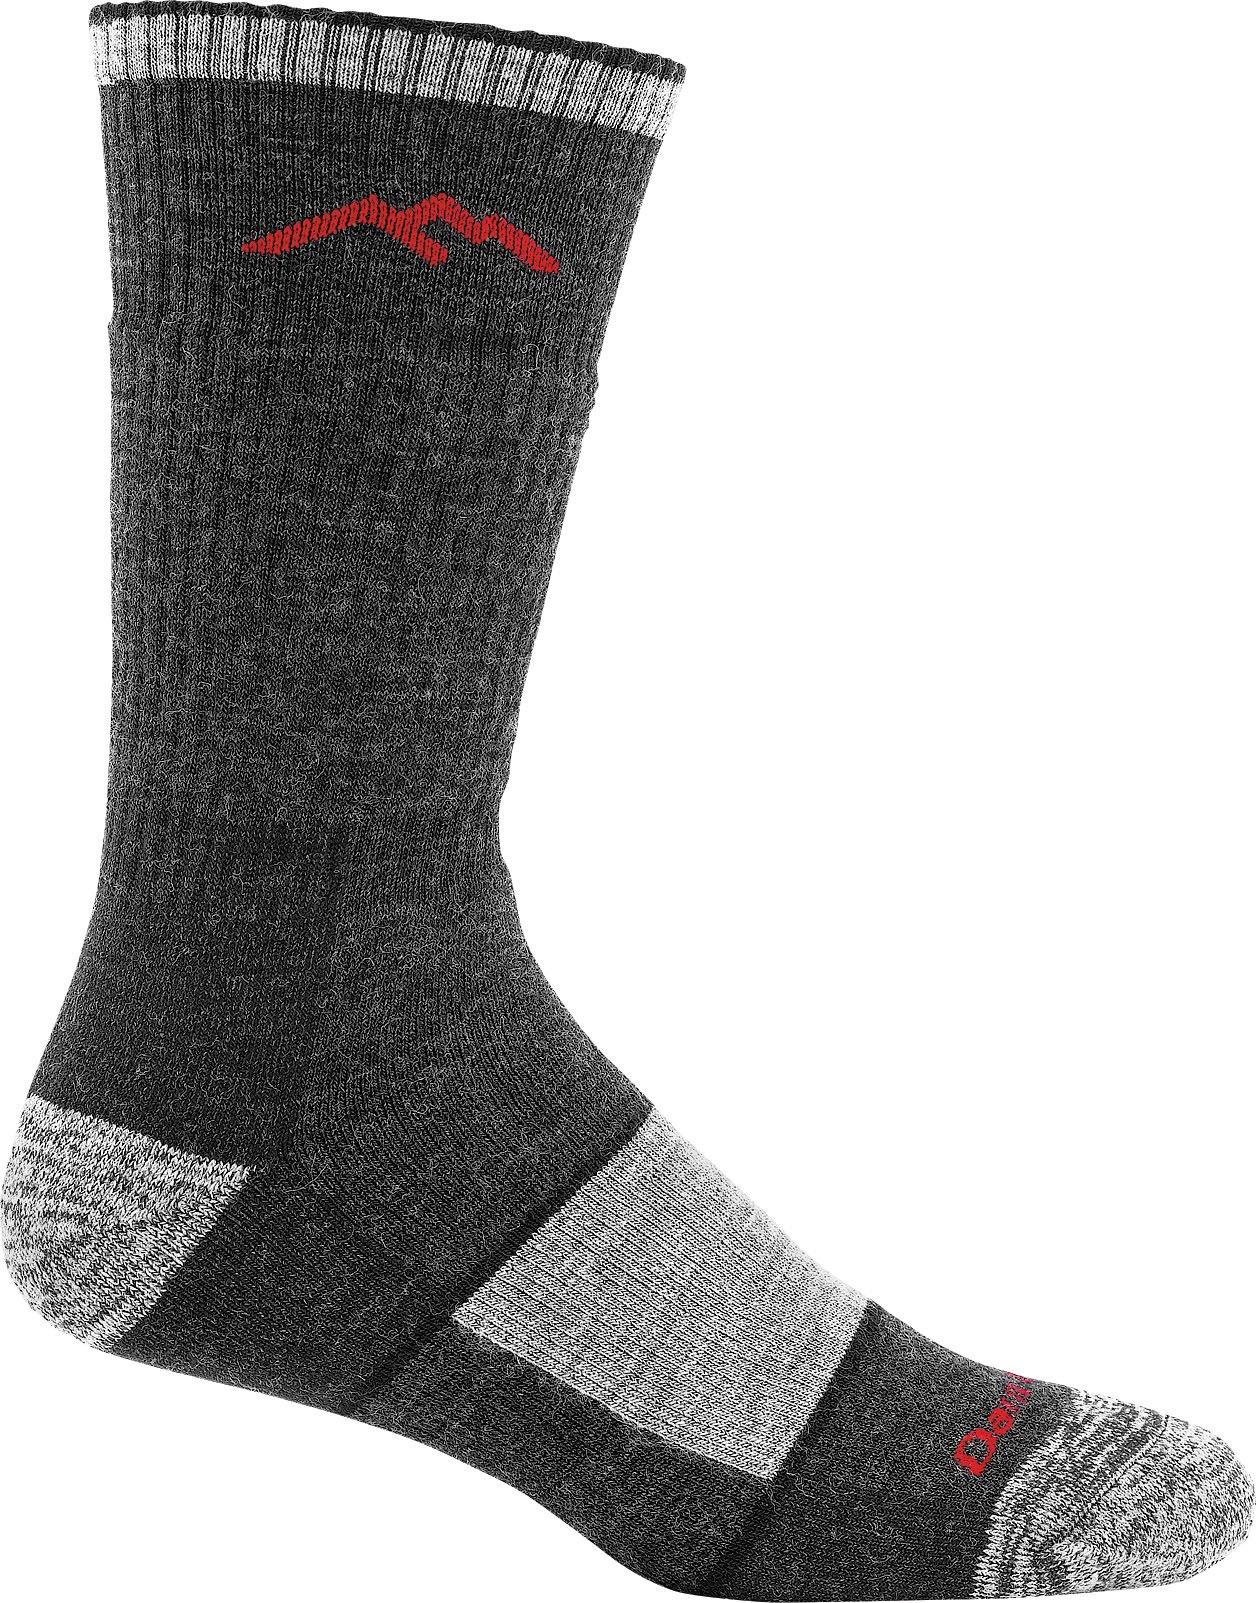 Darn Tough Vermont Men's Merino Wool Boot Full Cushion ( Style 1405 ) - 6 Pack Deal (XX-Large (15-17), Black)